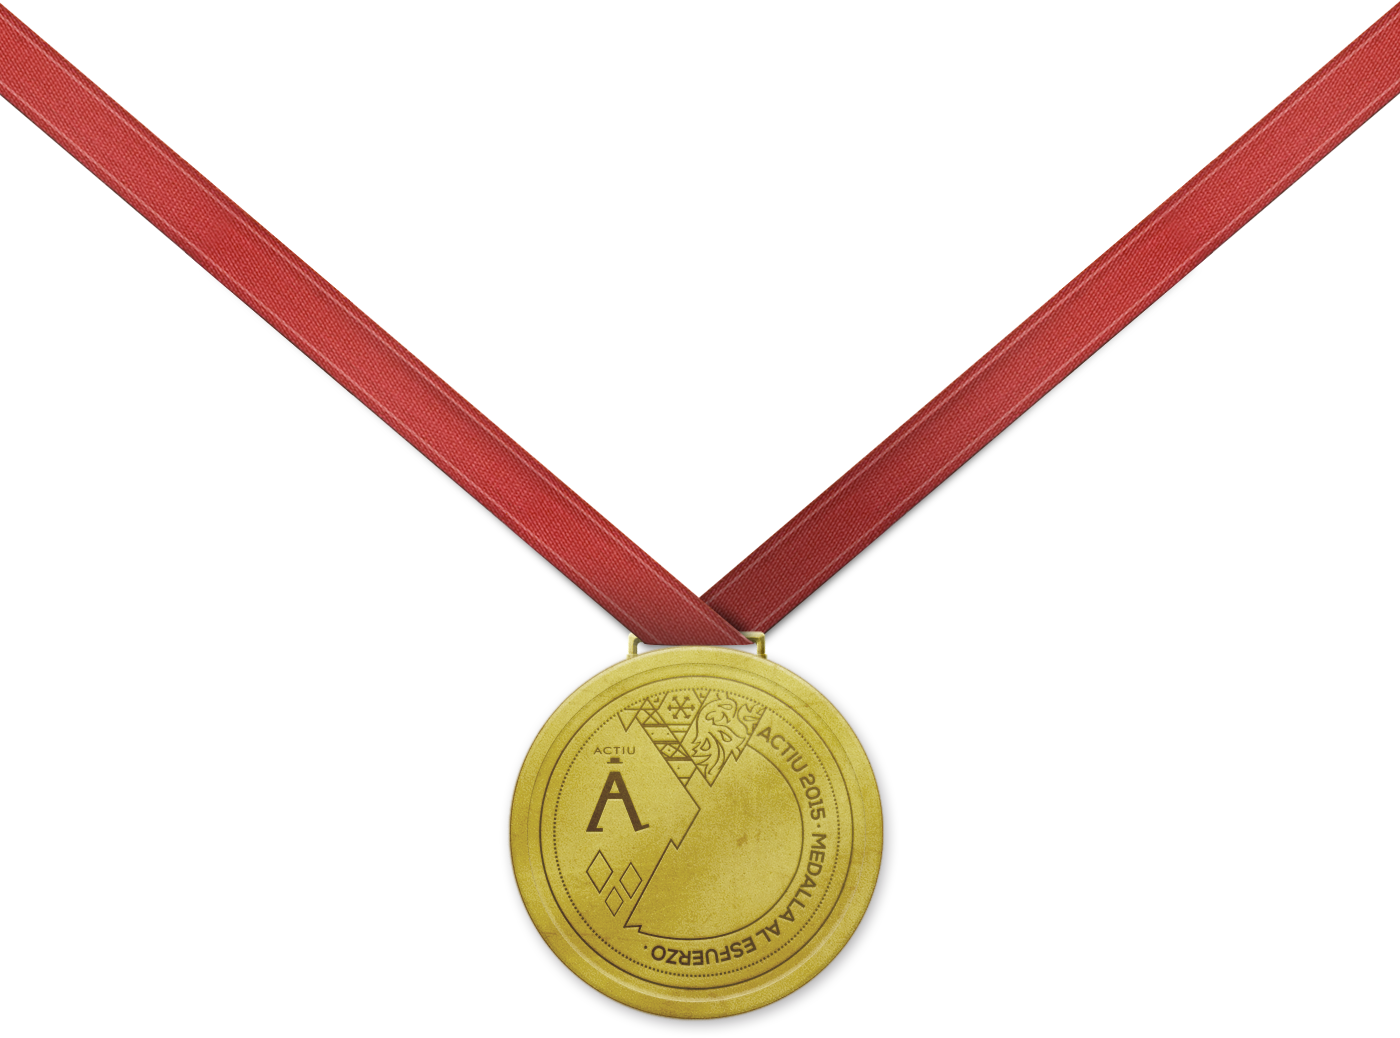 Medalla Actiu al esfuerzo